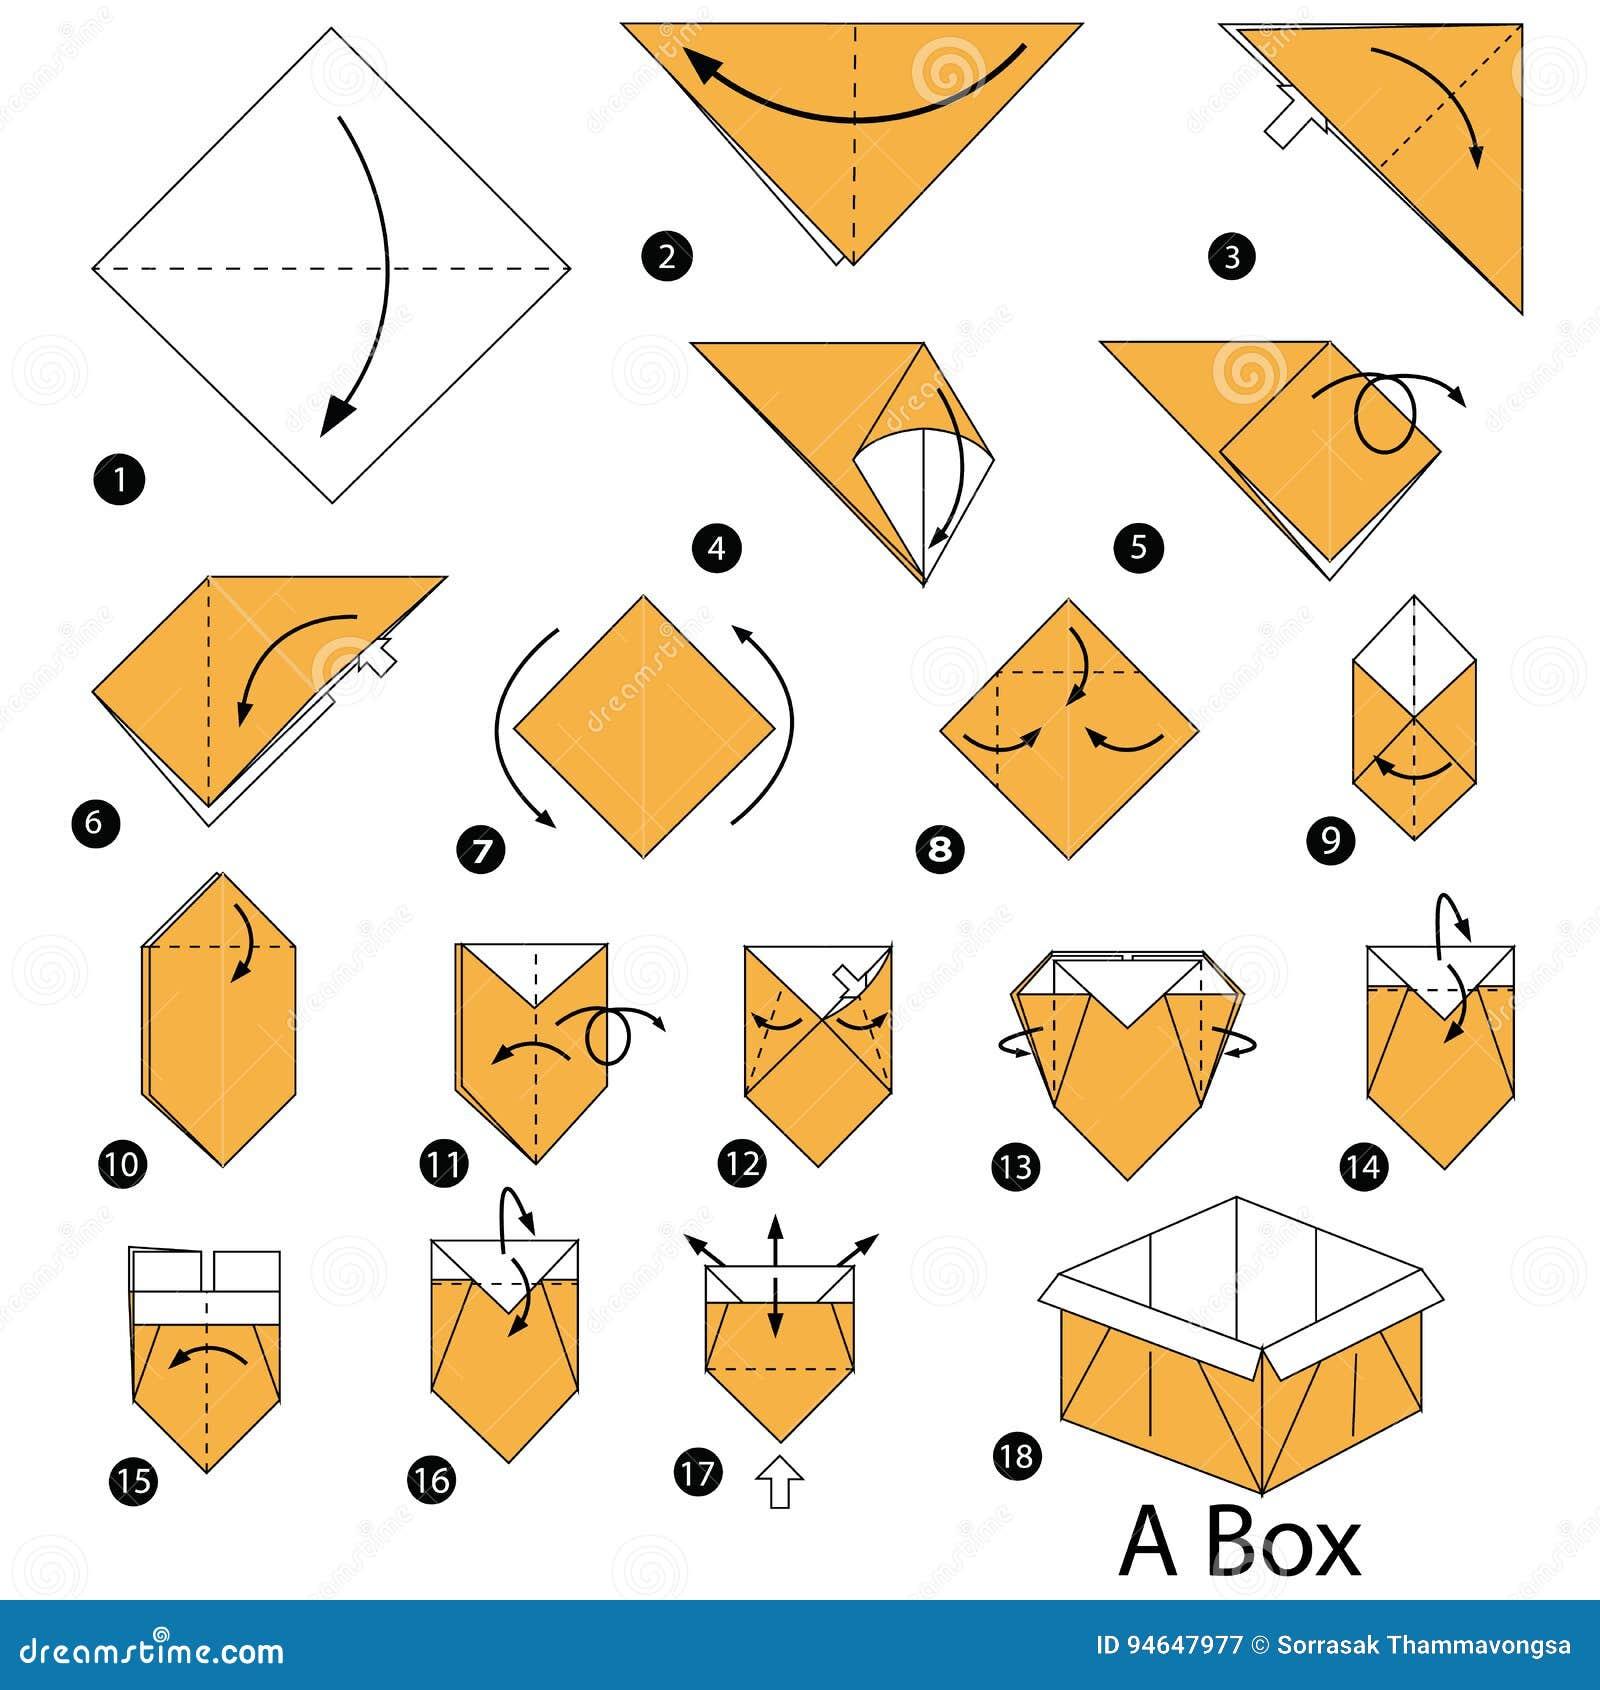 make abox